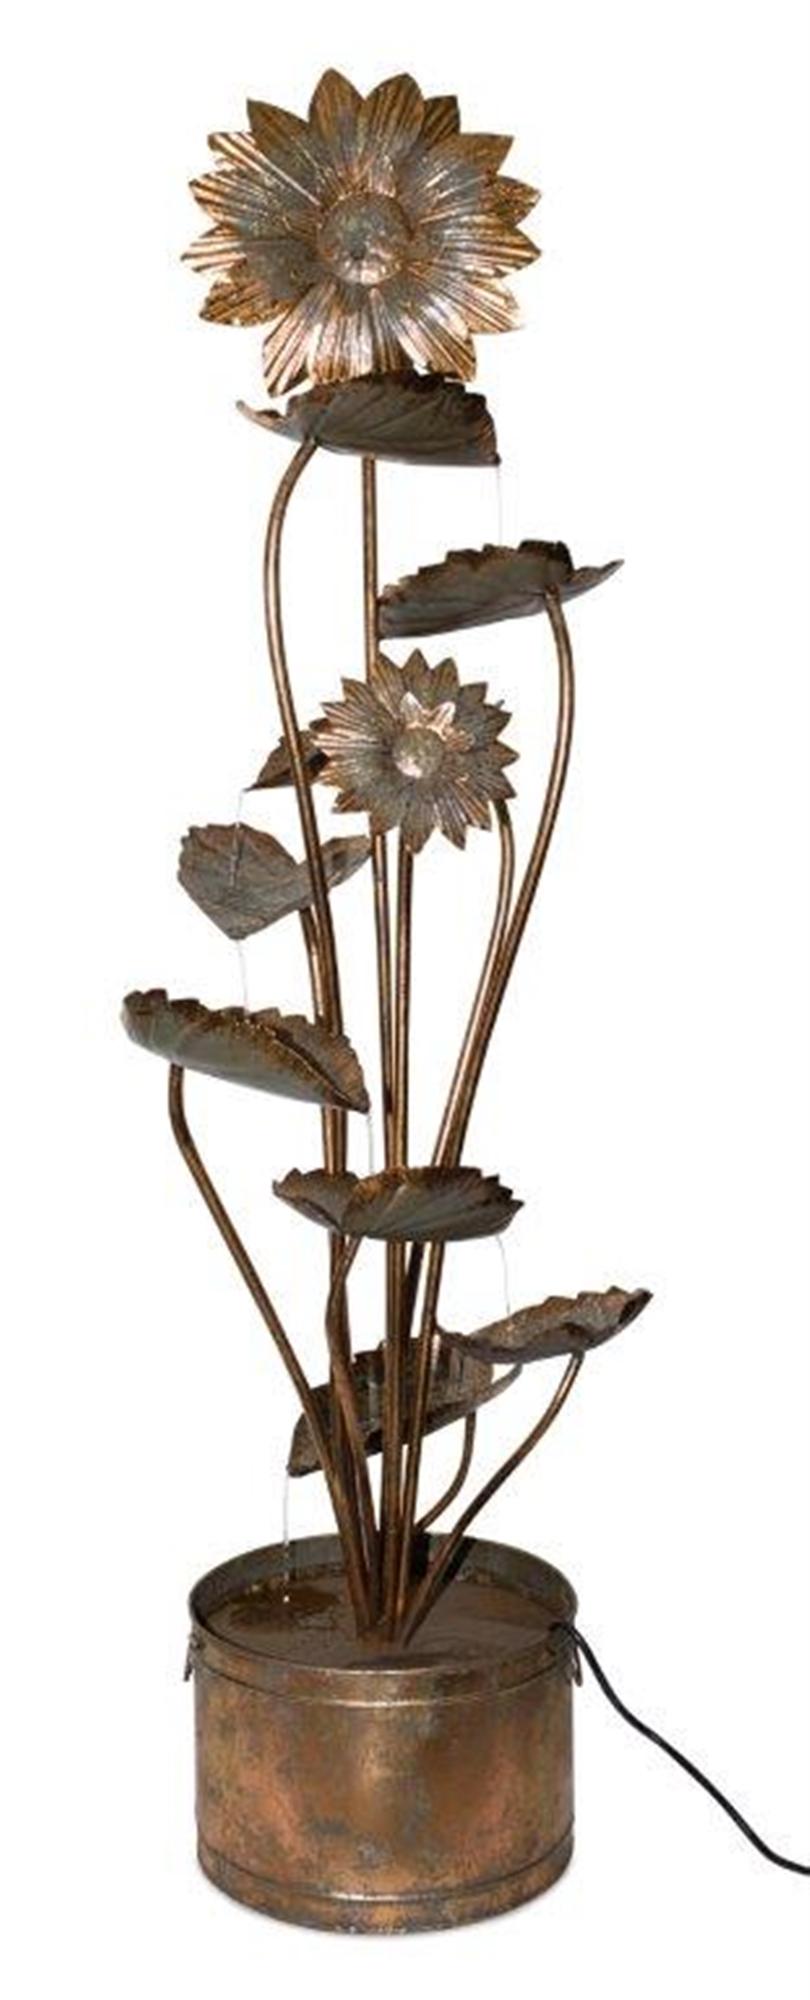 "Sunflower Fountain 19.5""L x 5'H Iron"